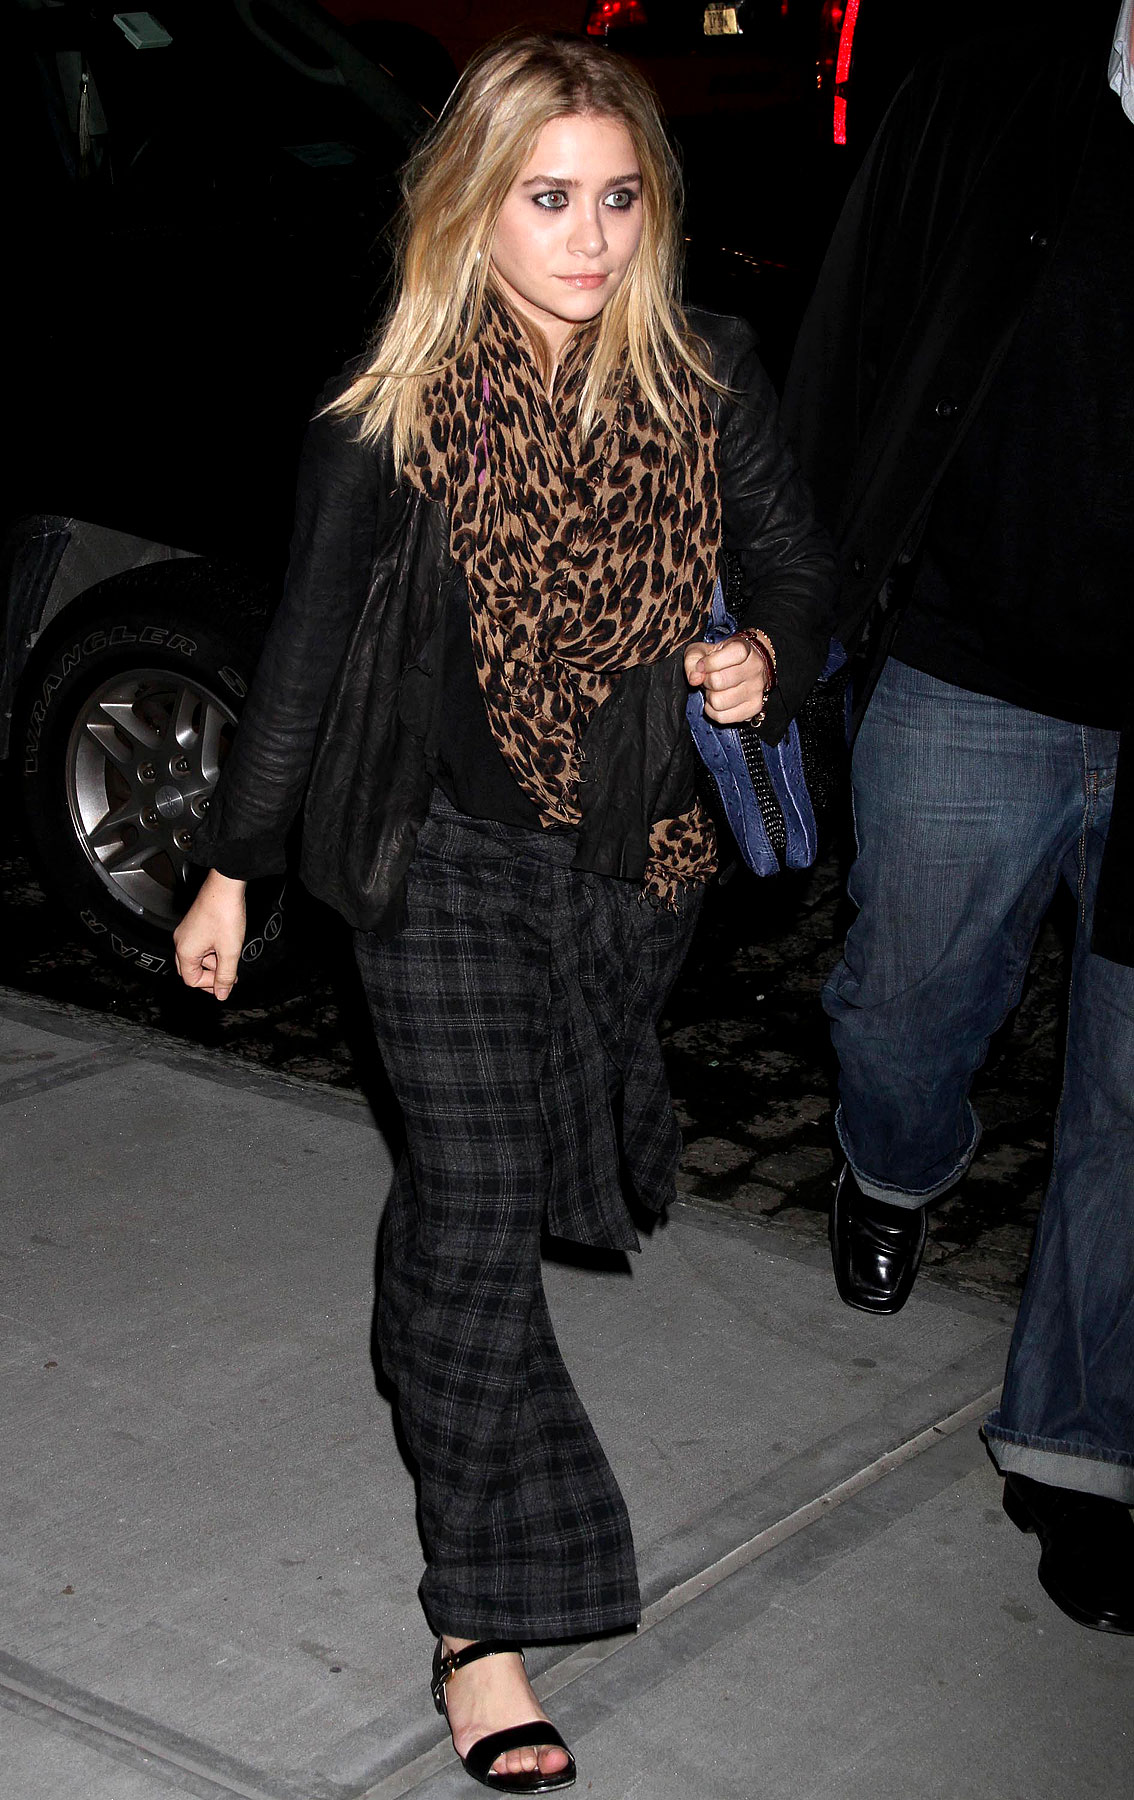 Ashley Olsen Wears A Refurbished Kilt (PHOTOS)